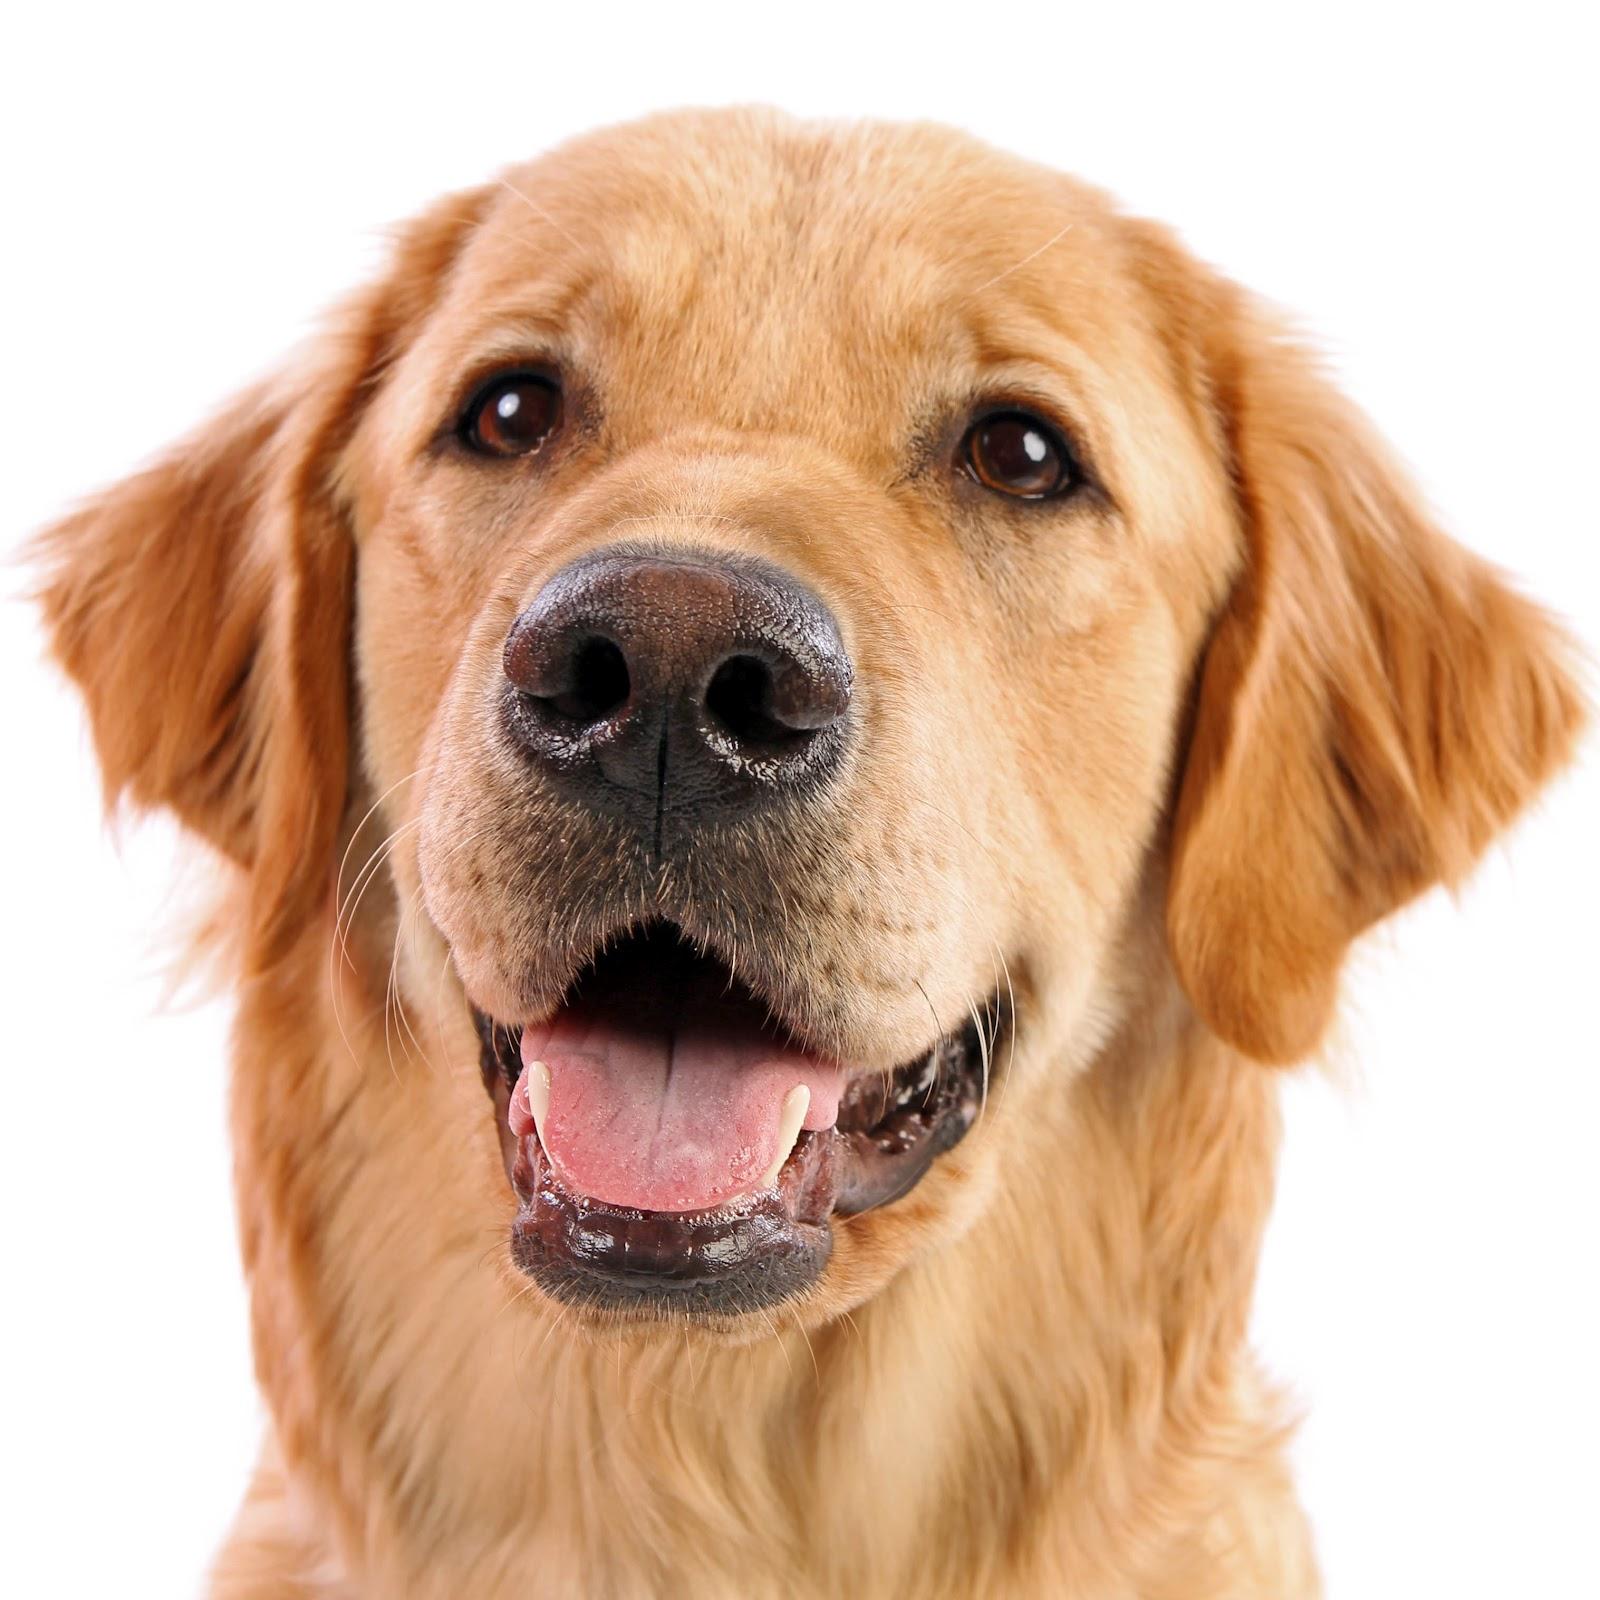 Dog PNG Jpg - 49592